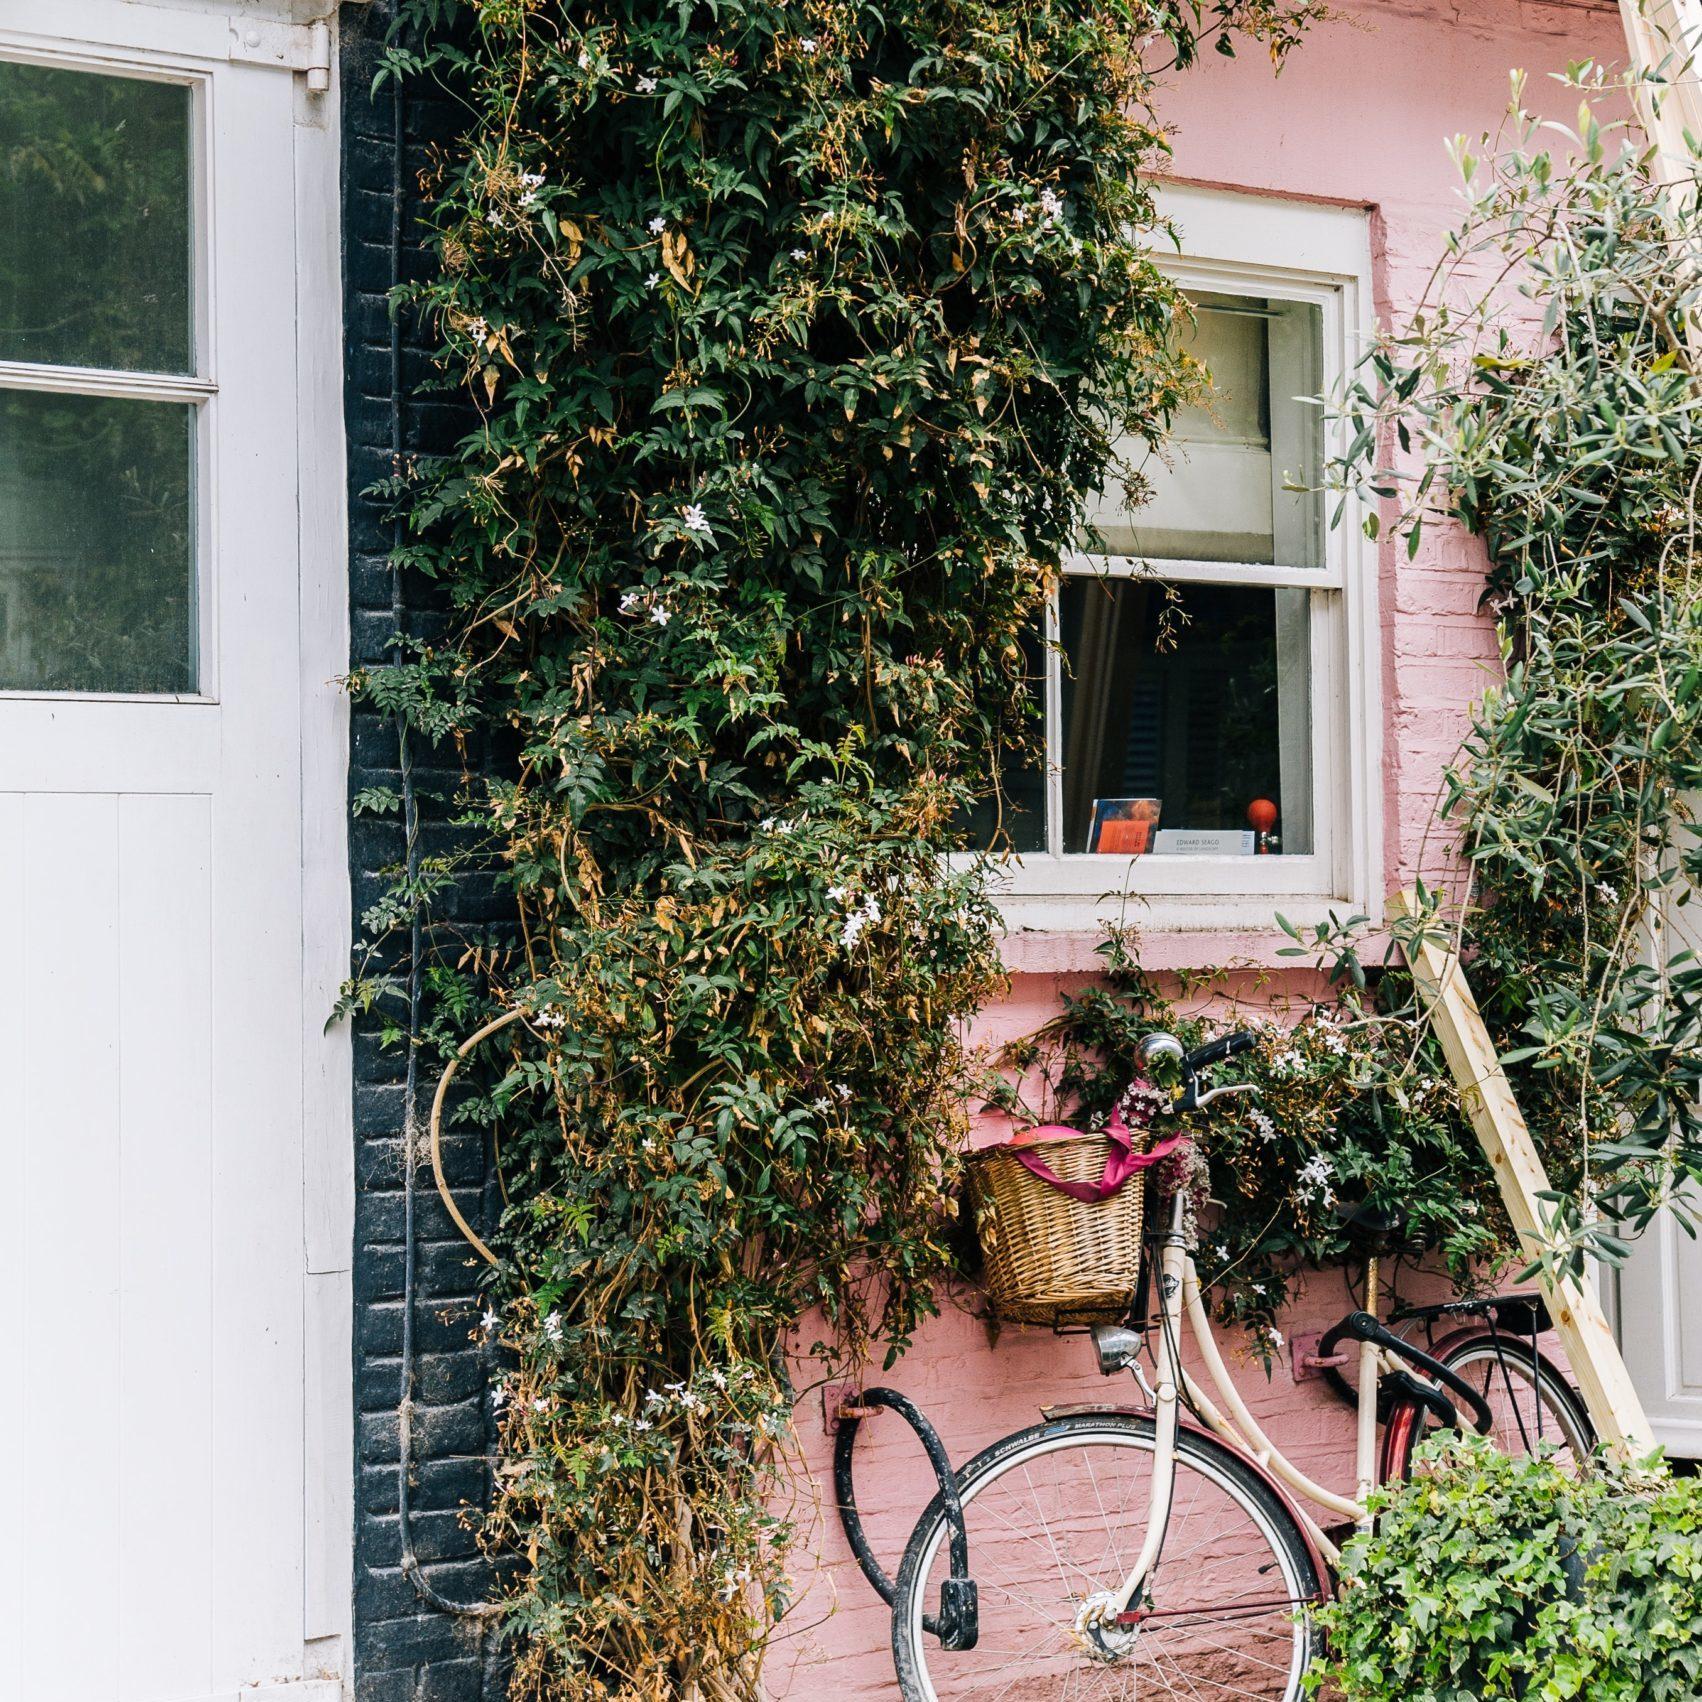 https://rozetluistervoer.nl/podcast-categorie/huis-en-tuin/